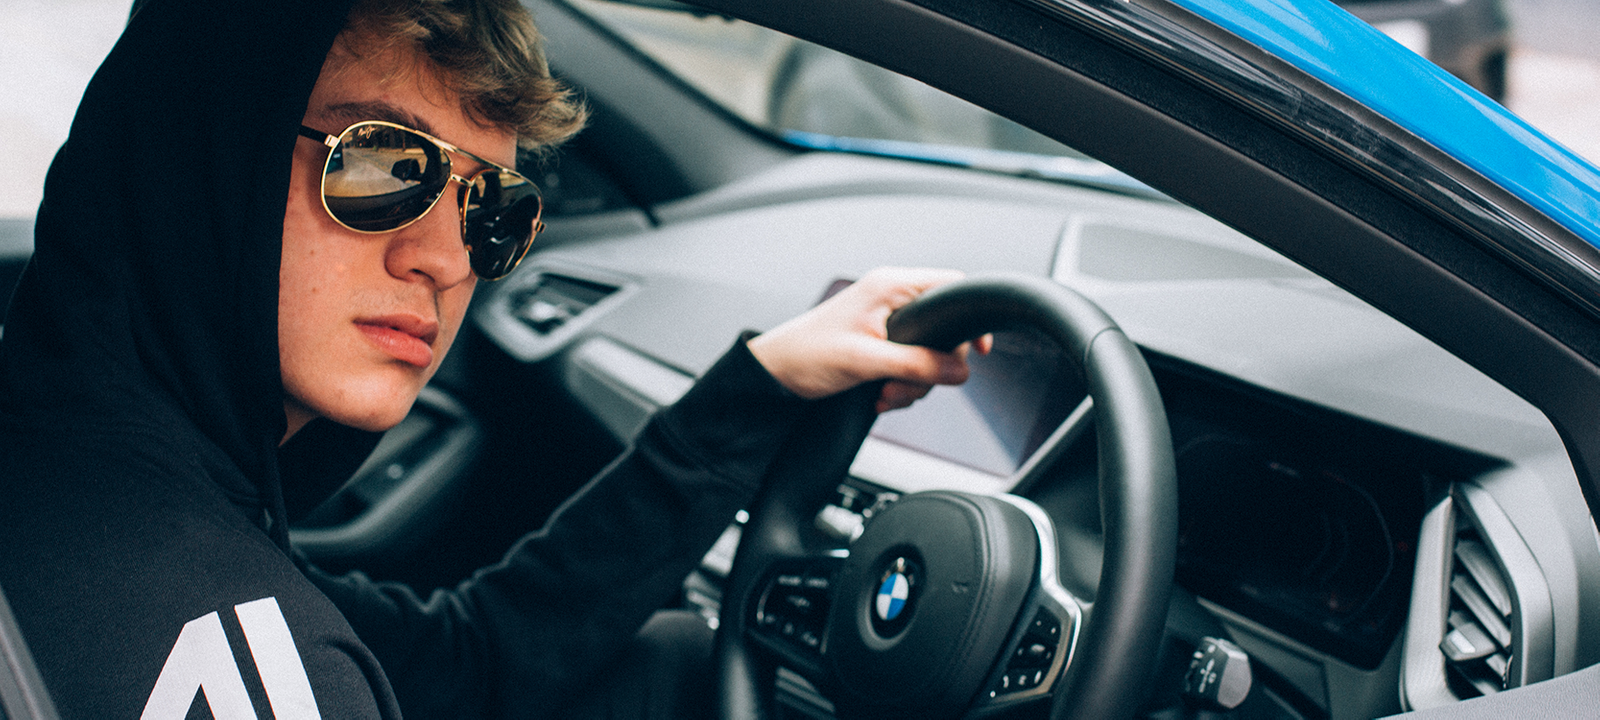 Player in a BMW car